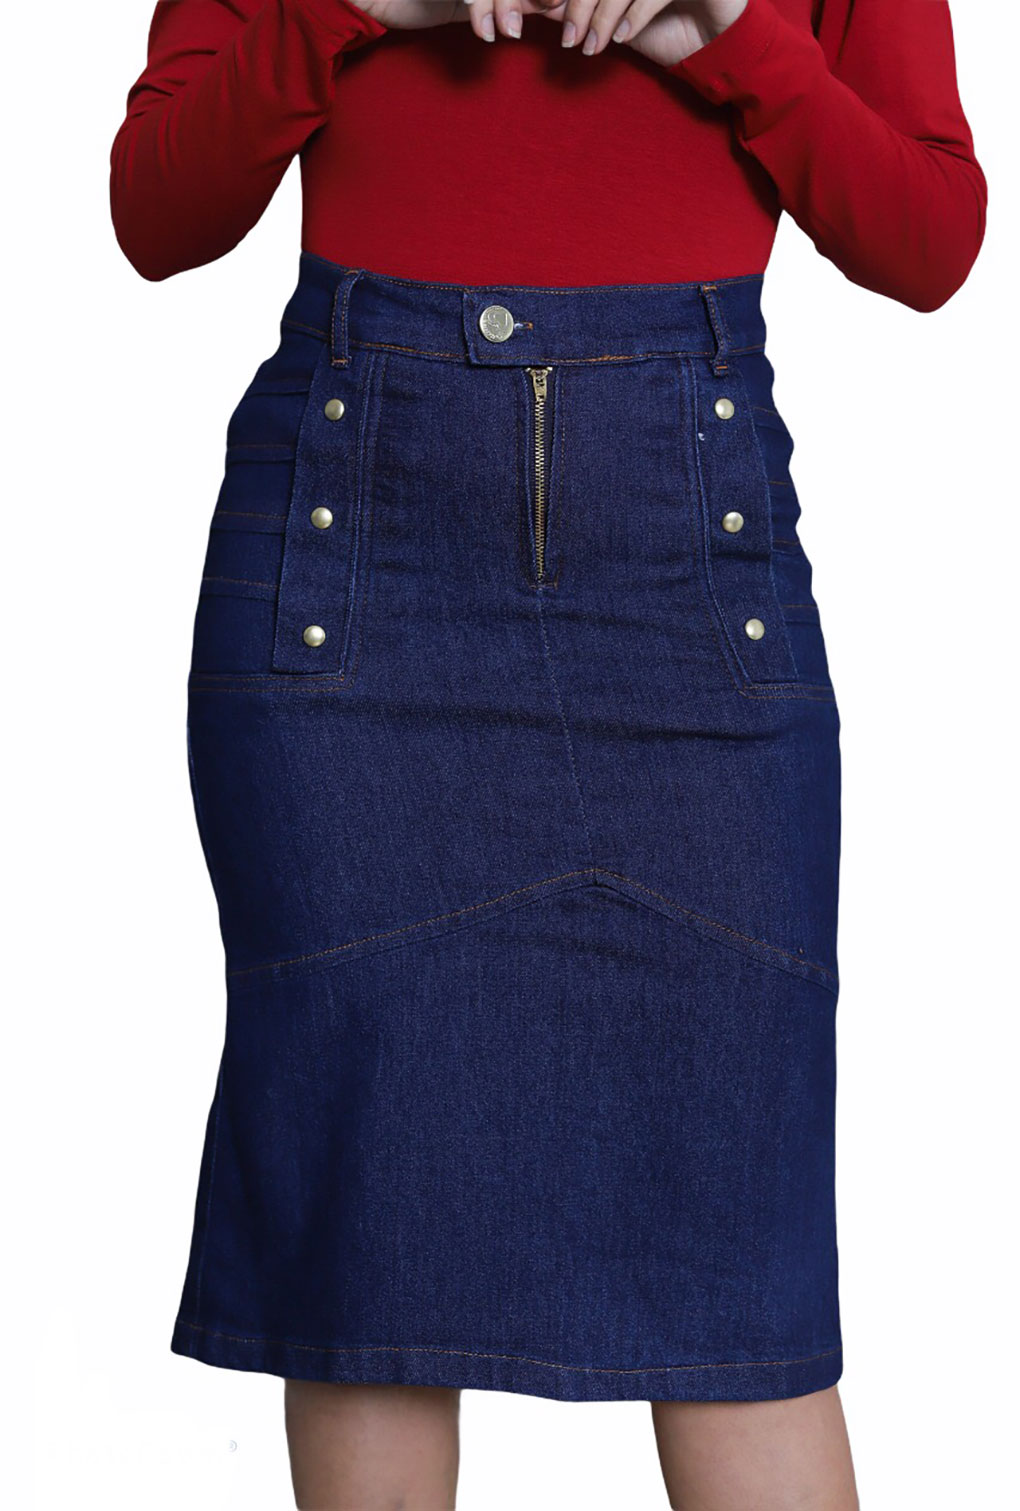 Saia Midi Moda Jeans Detalhe Botão Lateral Godê  - ModaStore | Moda Feminina